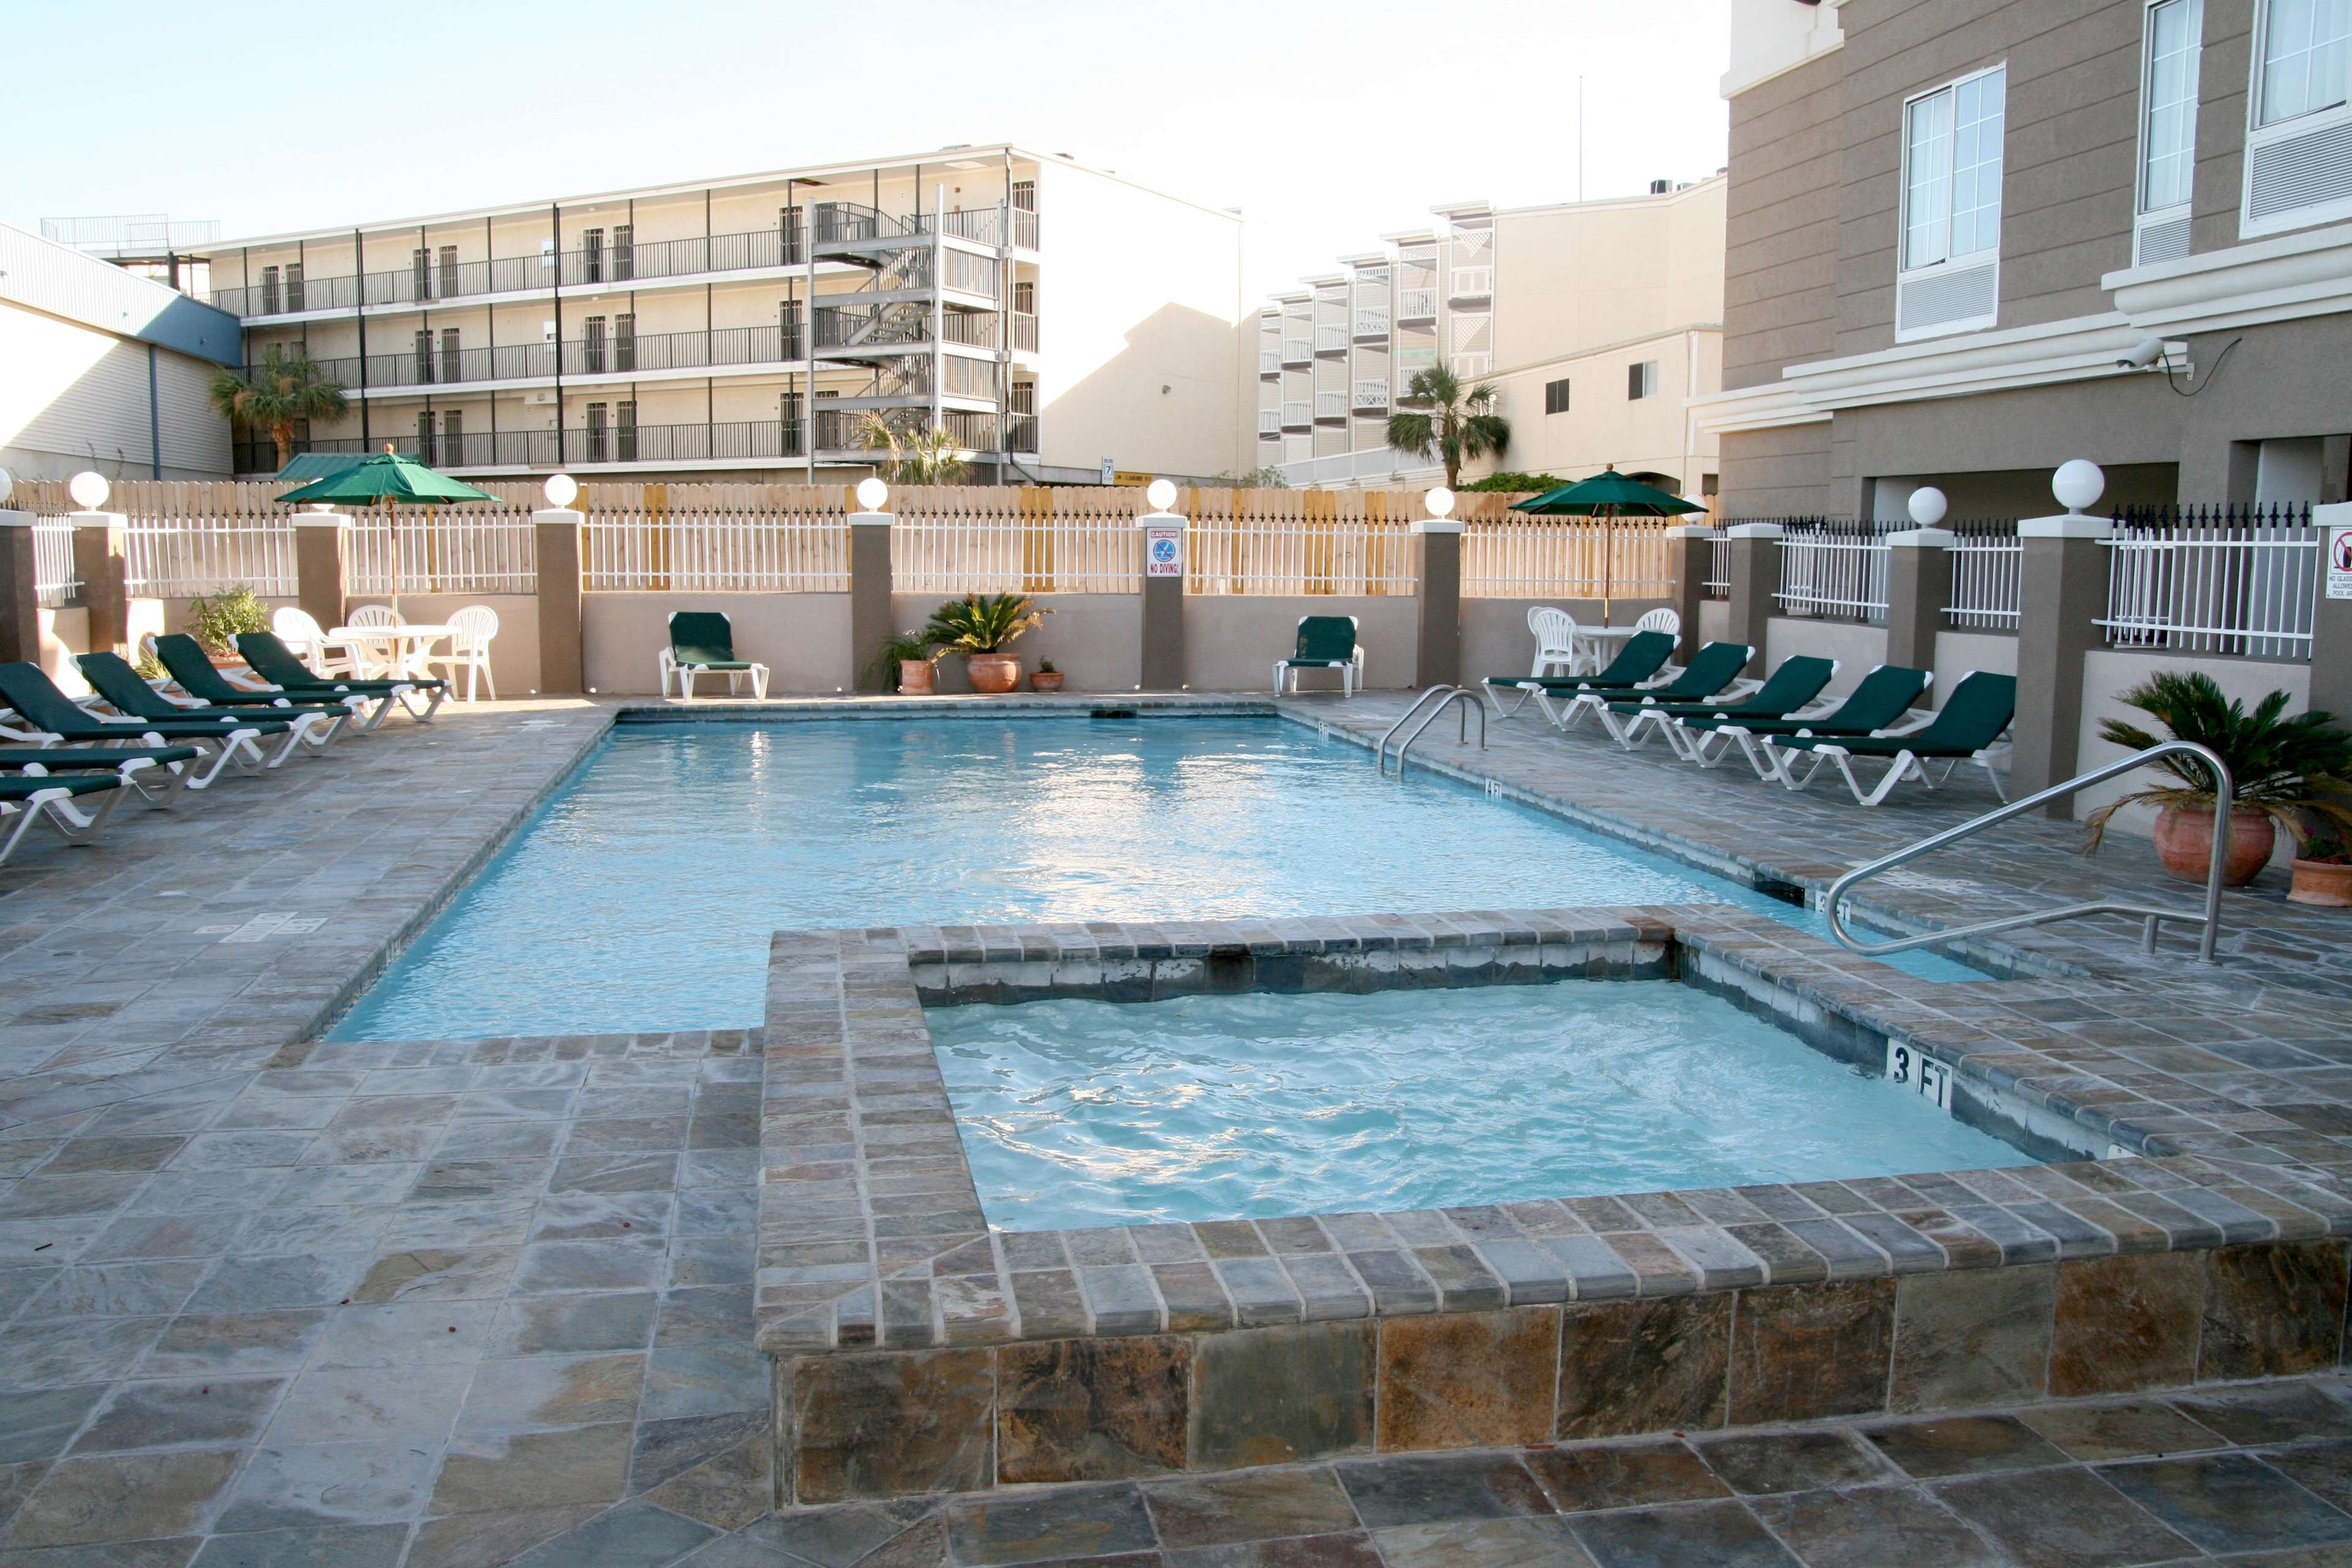 Hampton Inn & Suites Galveston image 9